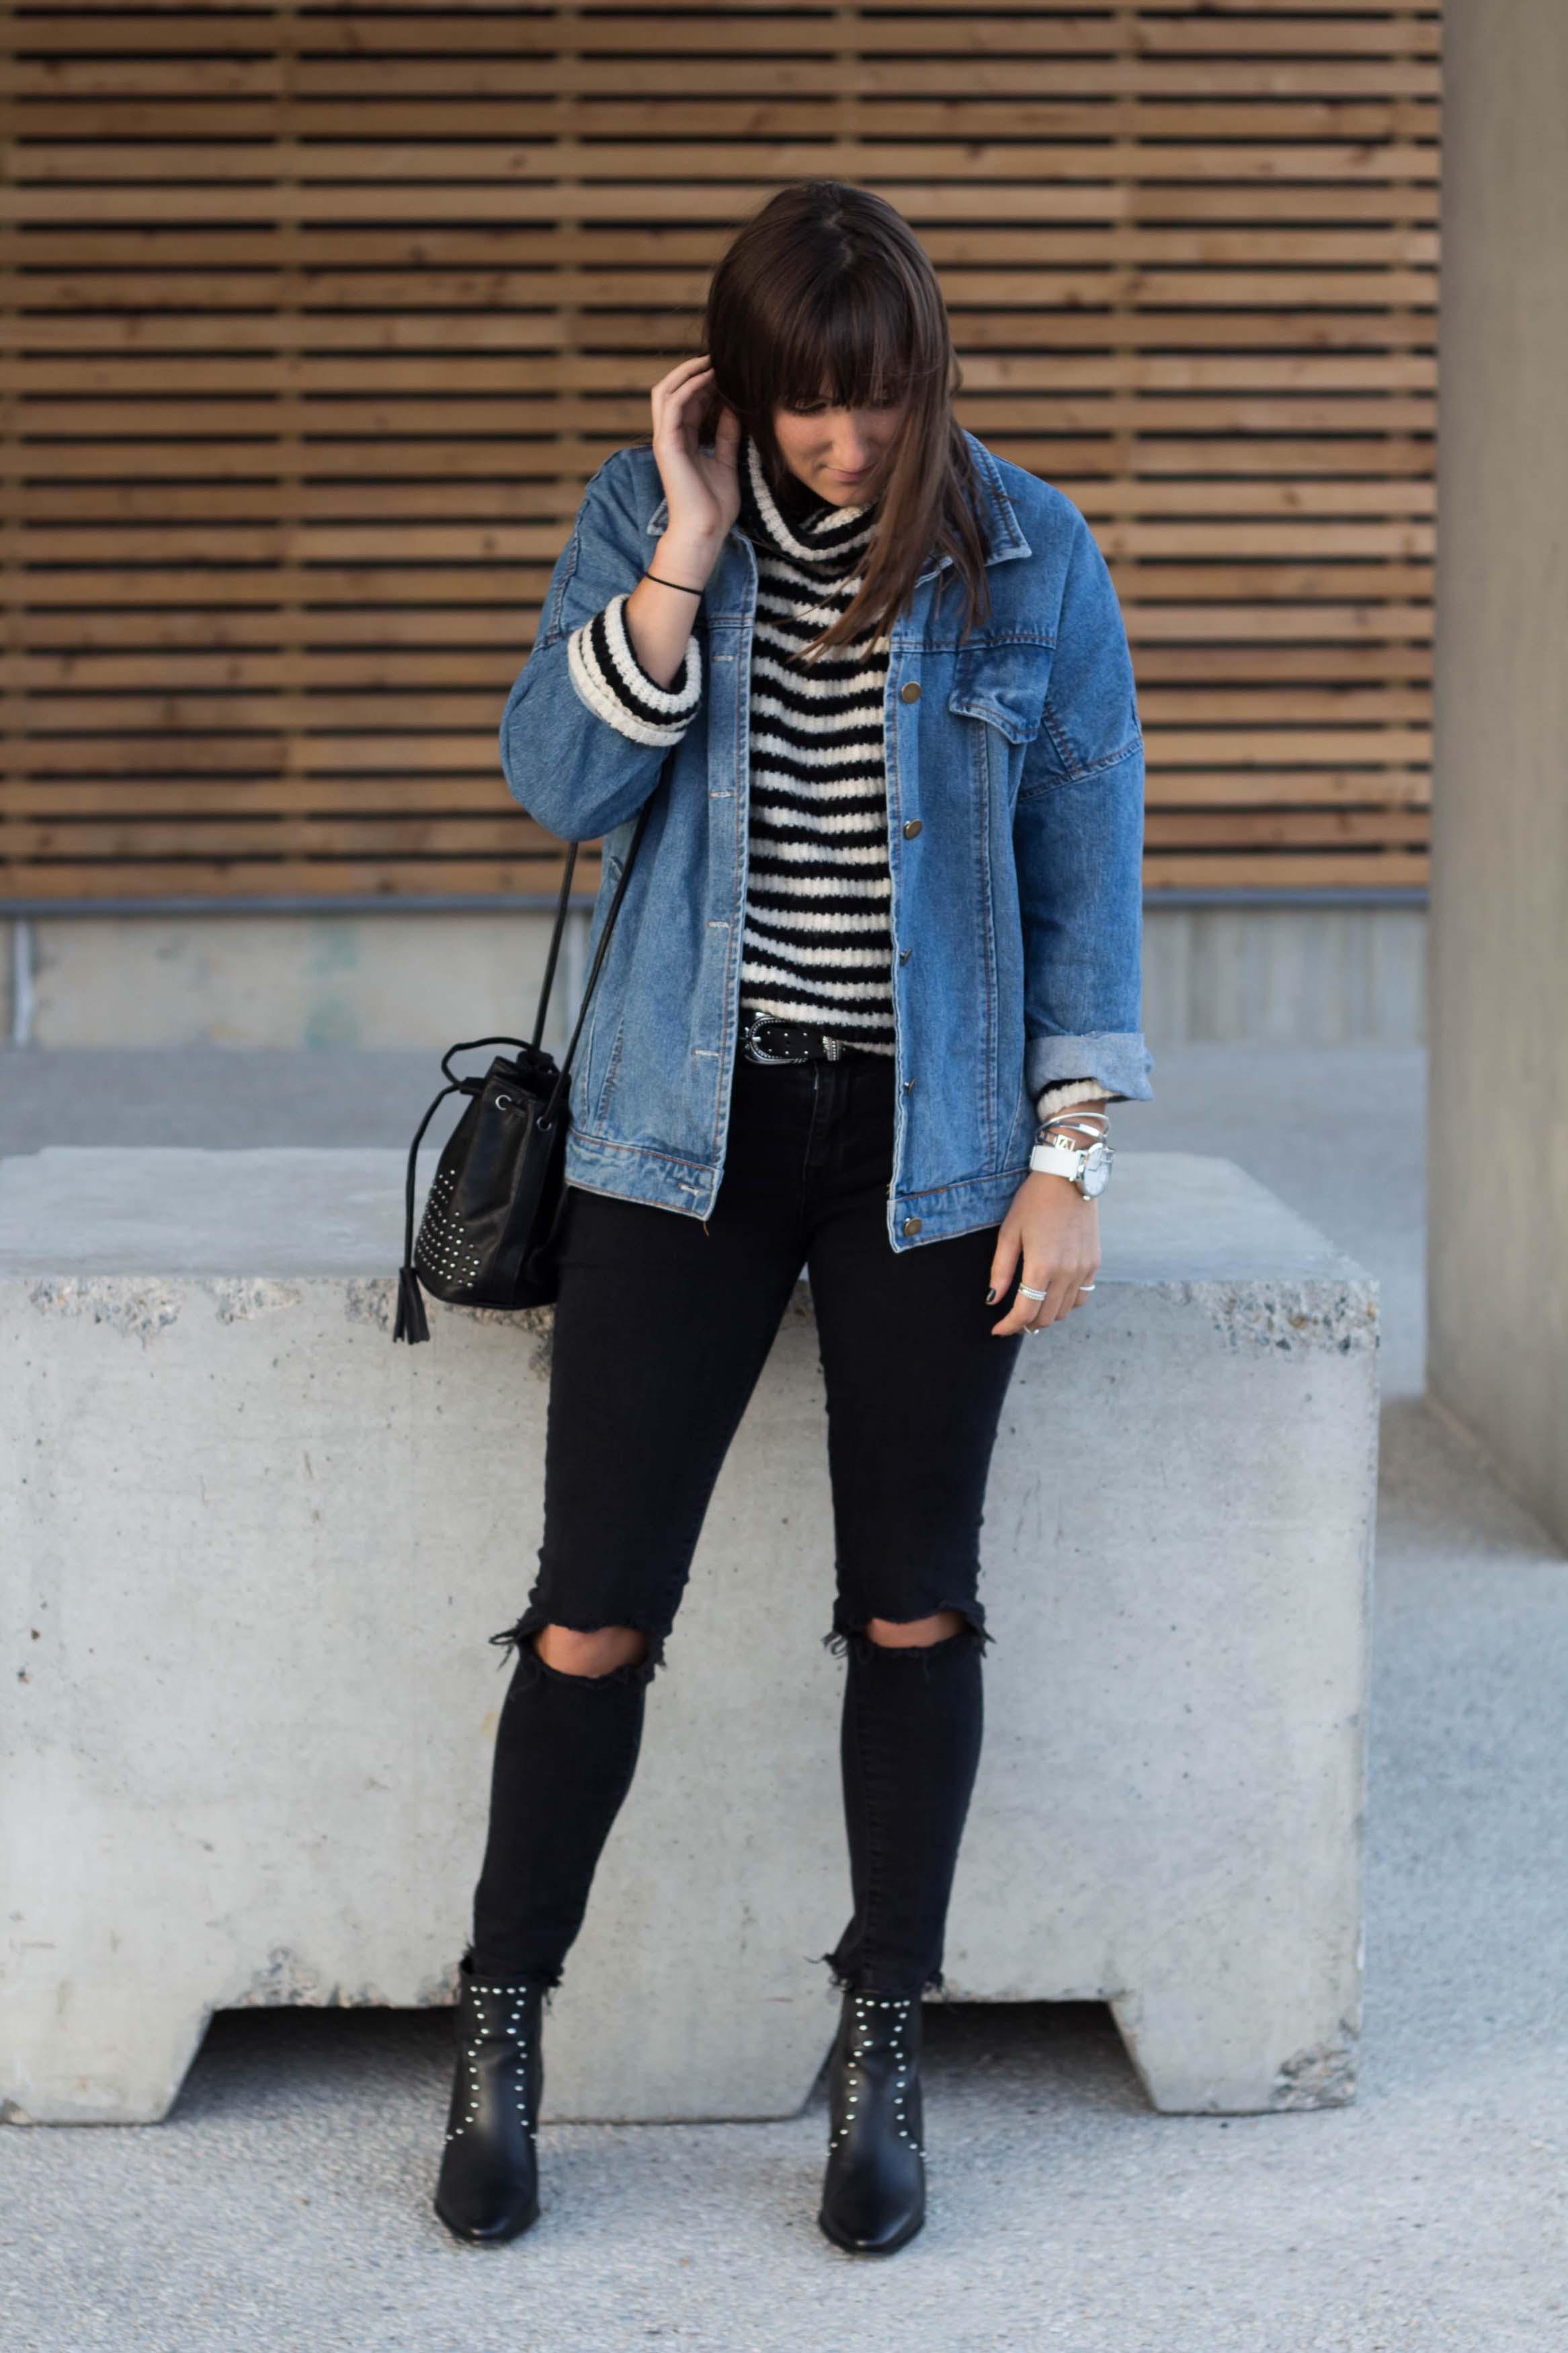 blog-mode-jean-shein-linstantflo-3-sur-18